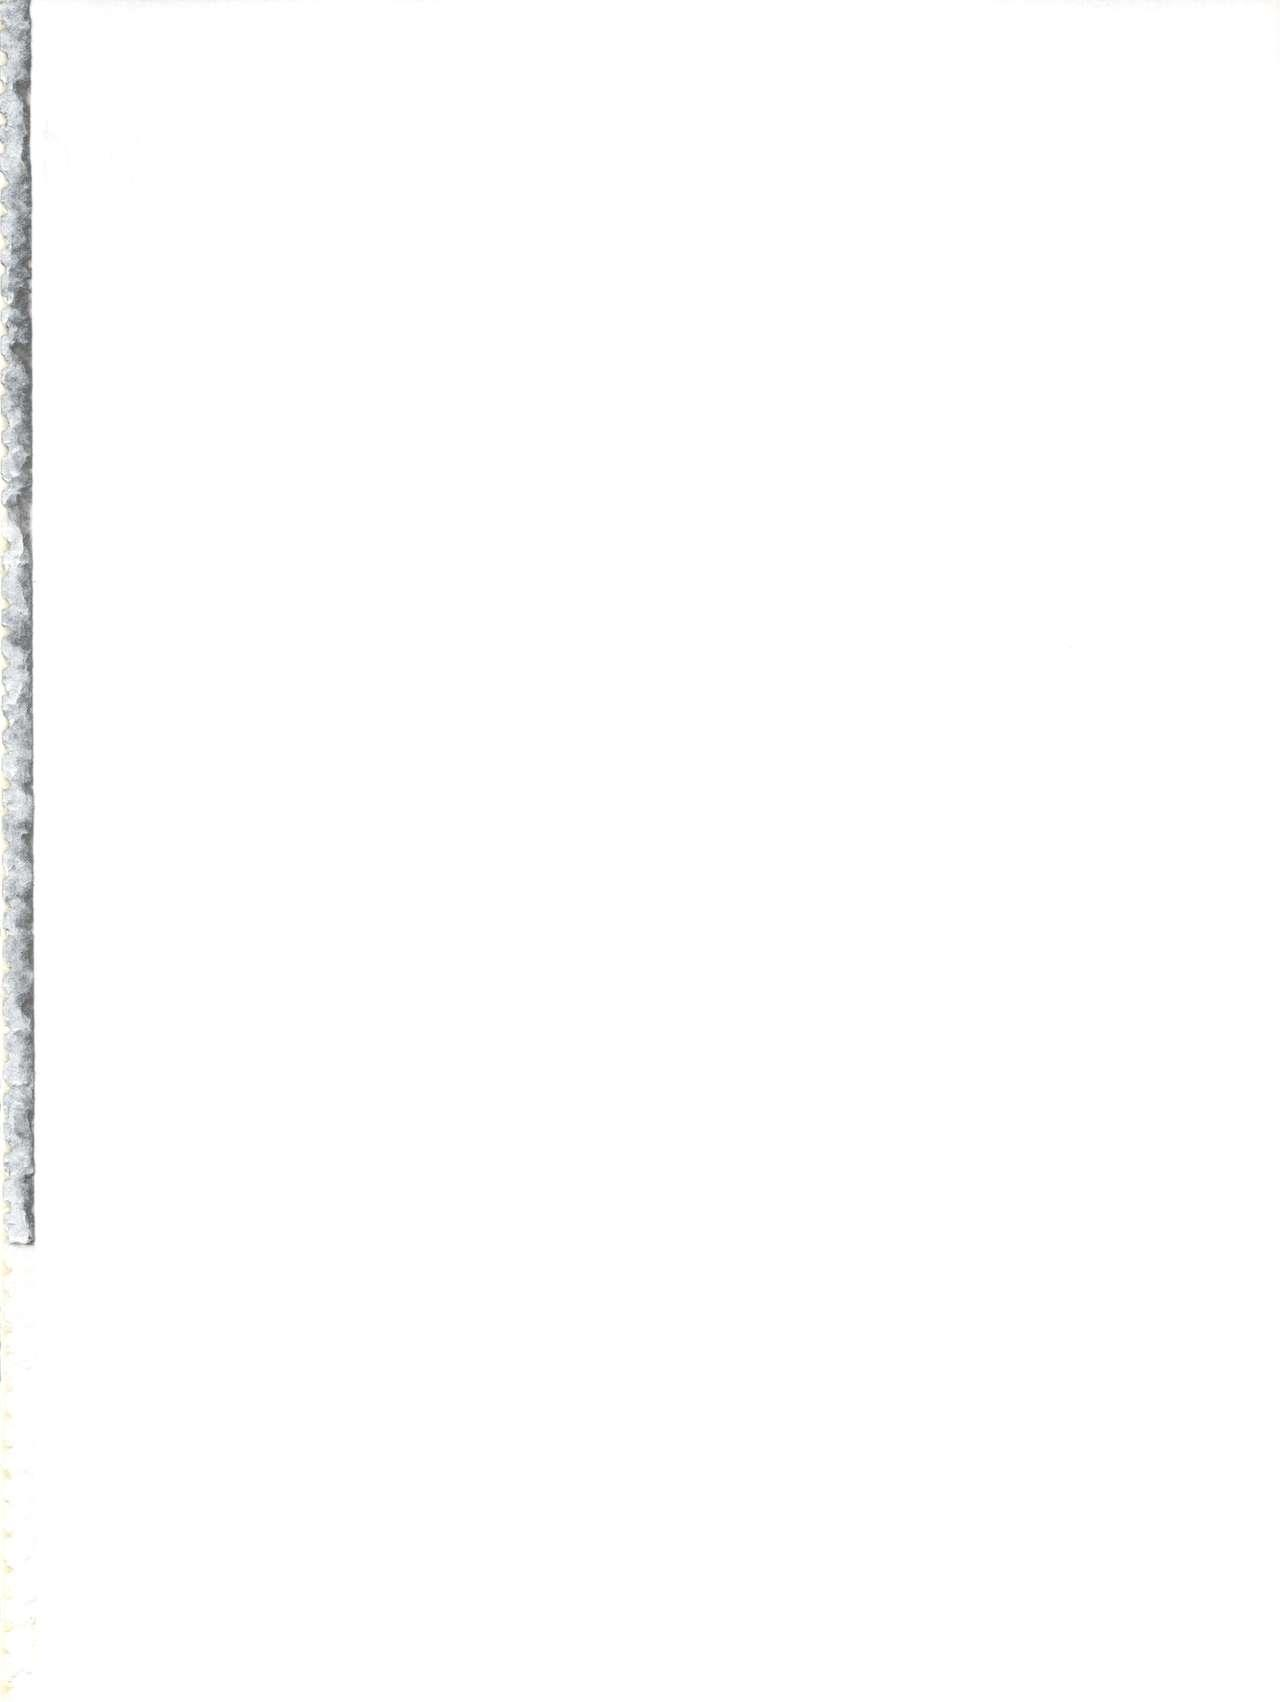 (C93) [Old School Academy (Amedama Akihito)] Fushigi-san no HENTAI ☆ MAHOH Futanari-hen (Creamy Mami, Magical Emi, Pastel Yumi, Magical Fairy Persia, Fancy Lala) 1